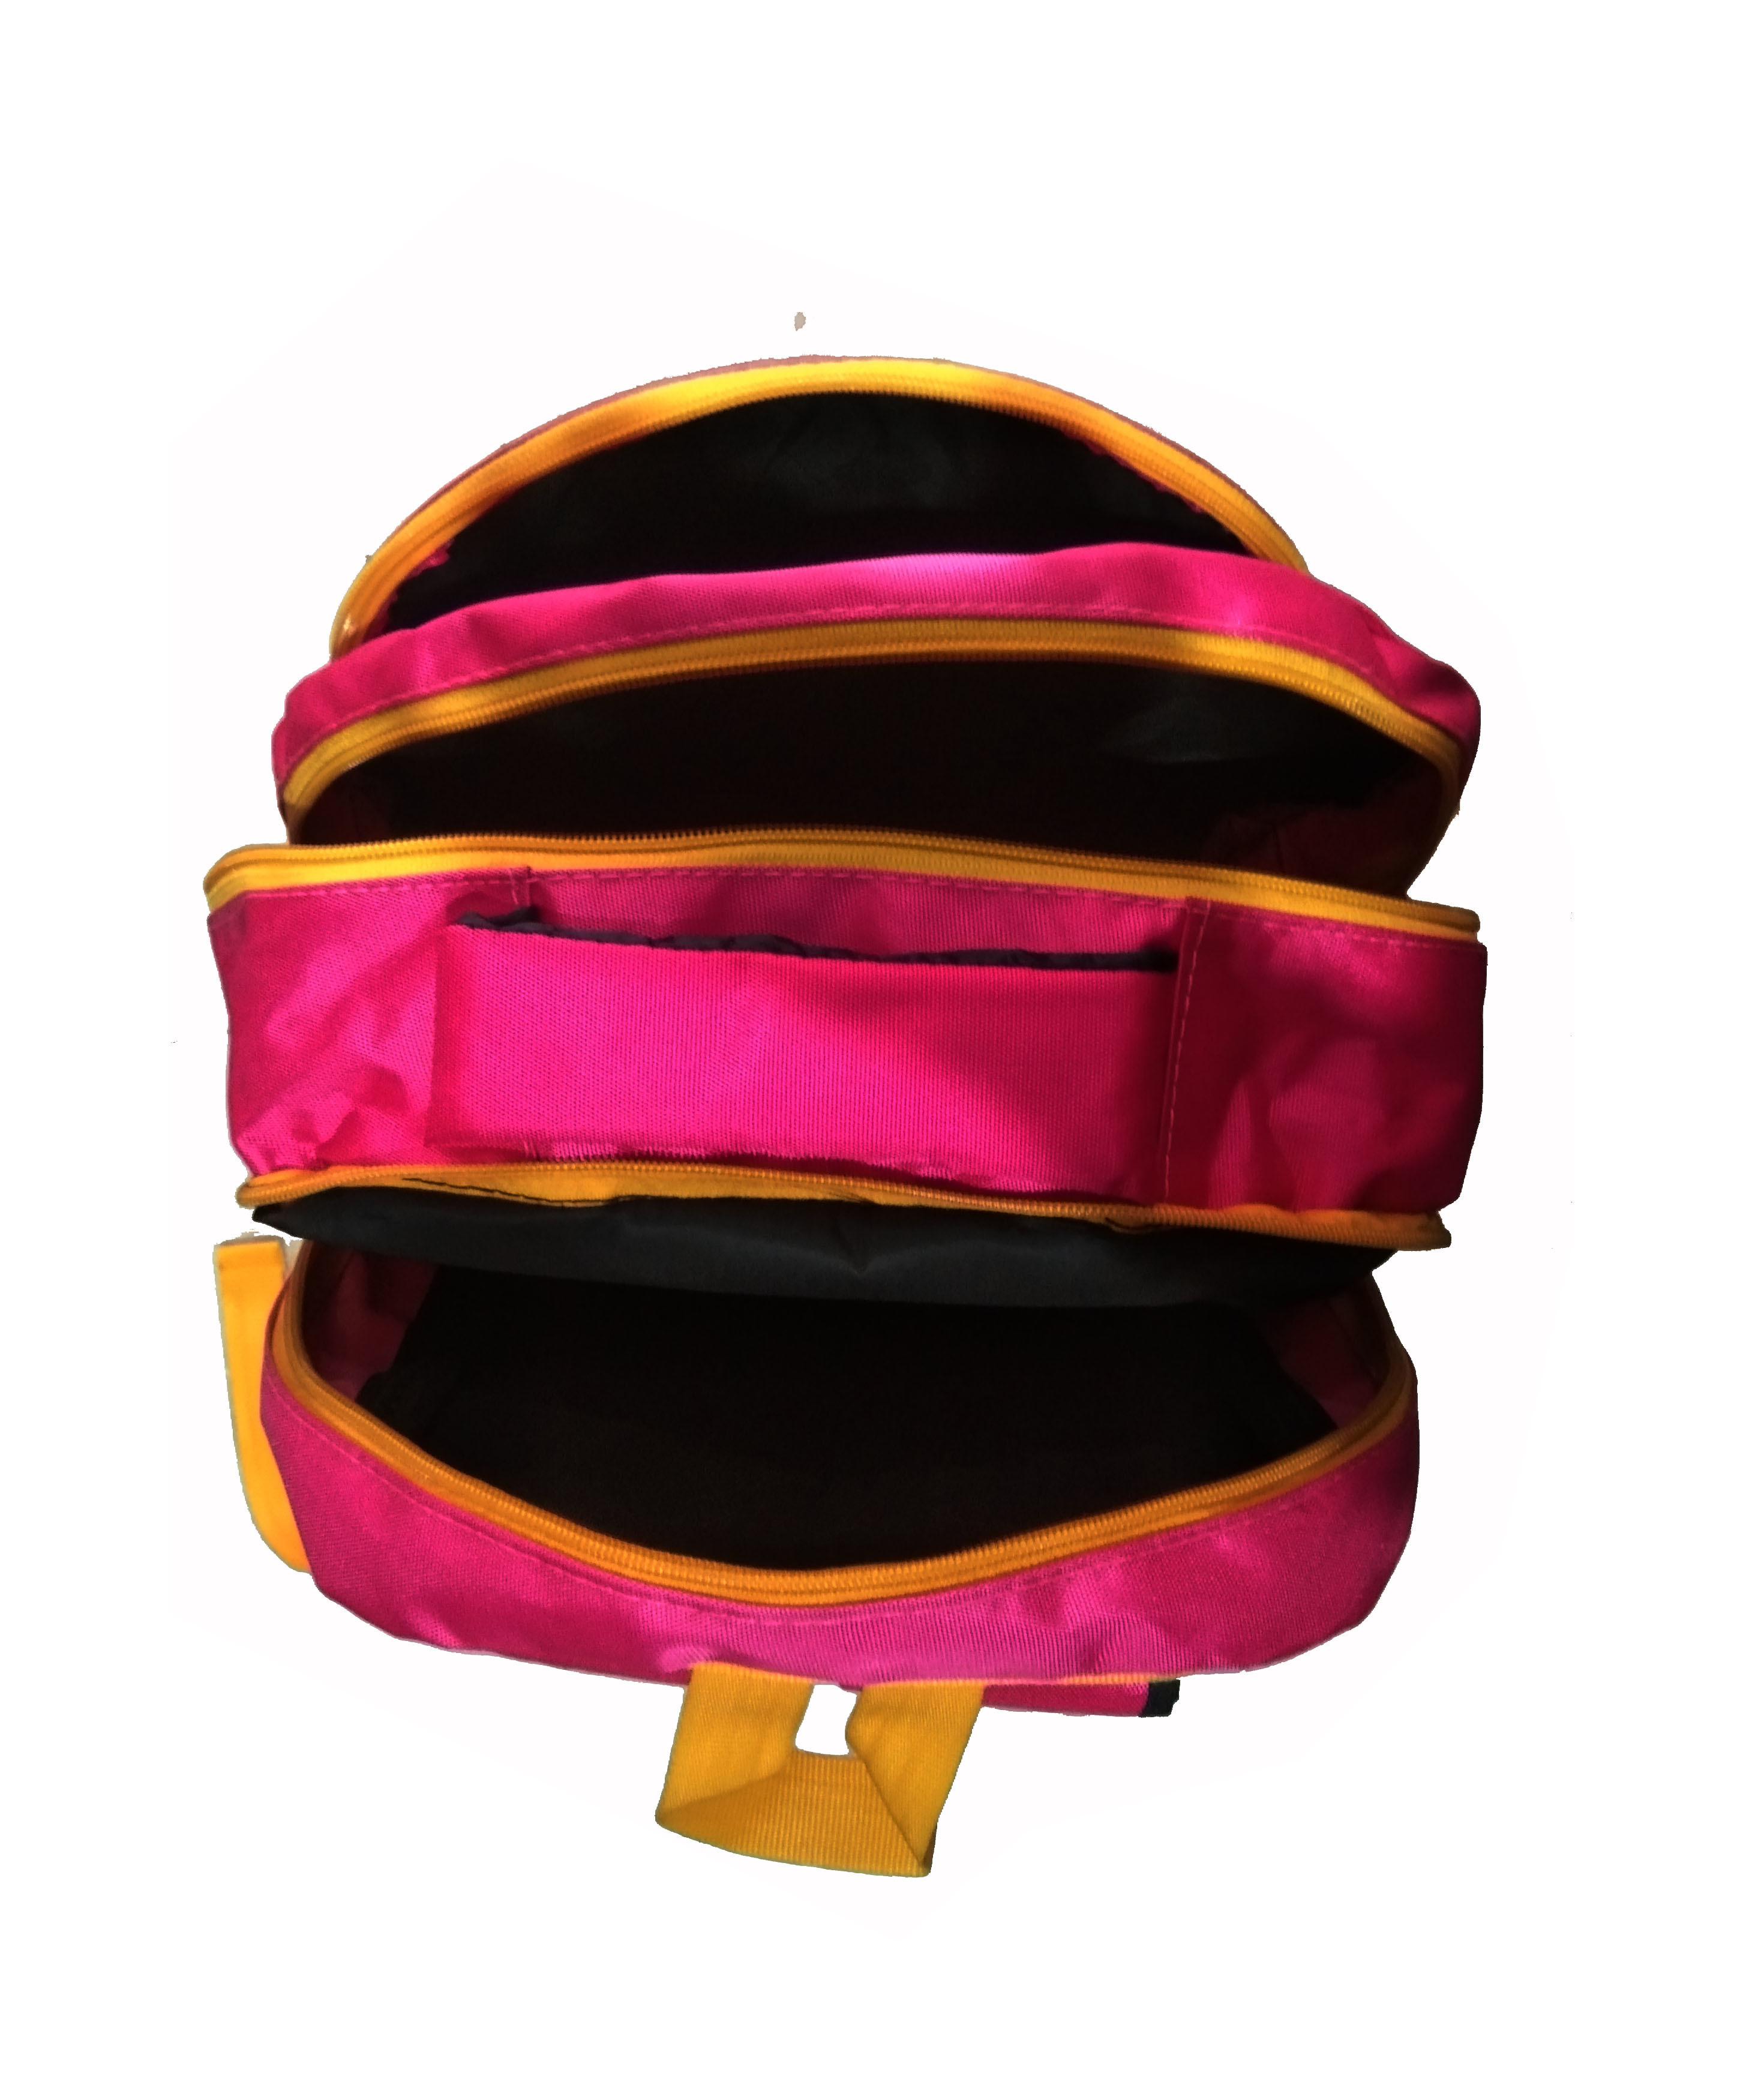 PBH P_P0119 9 Liters Unisex Backpack